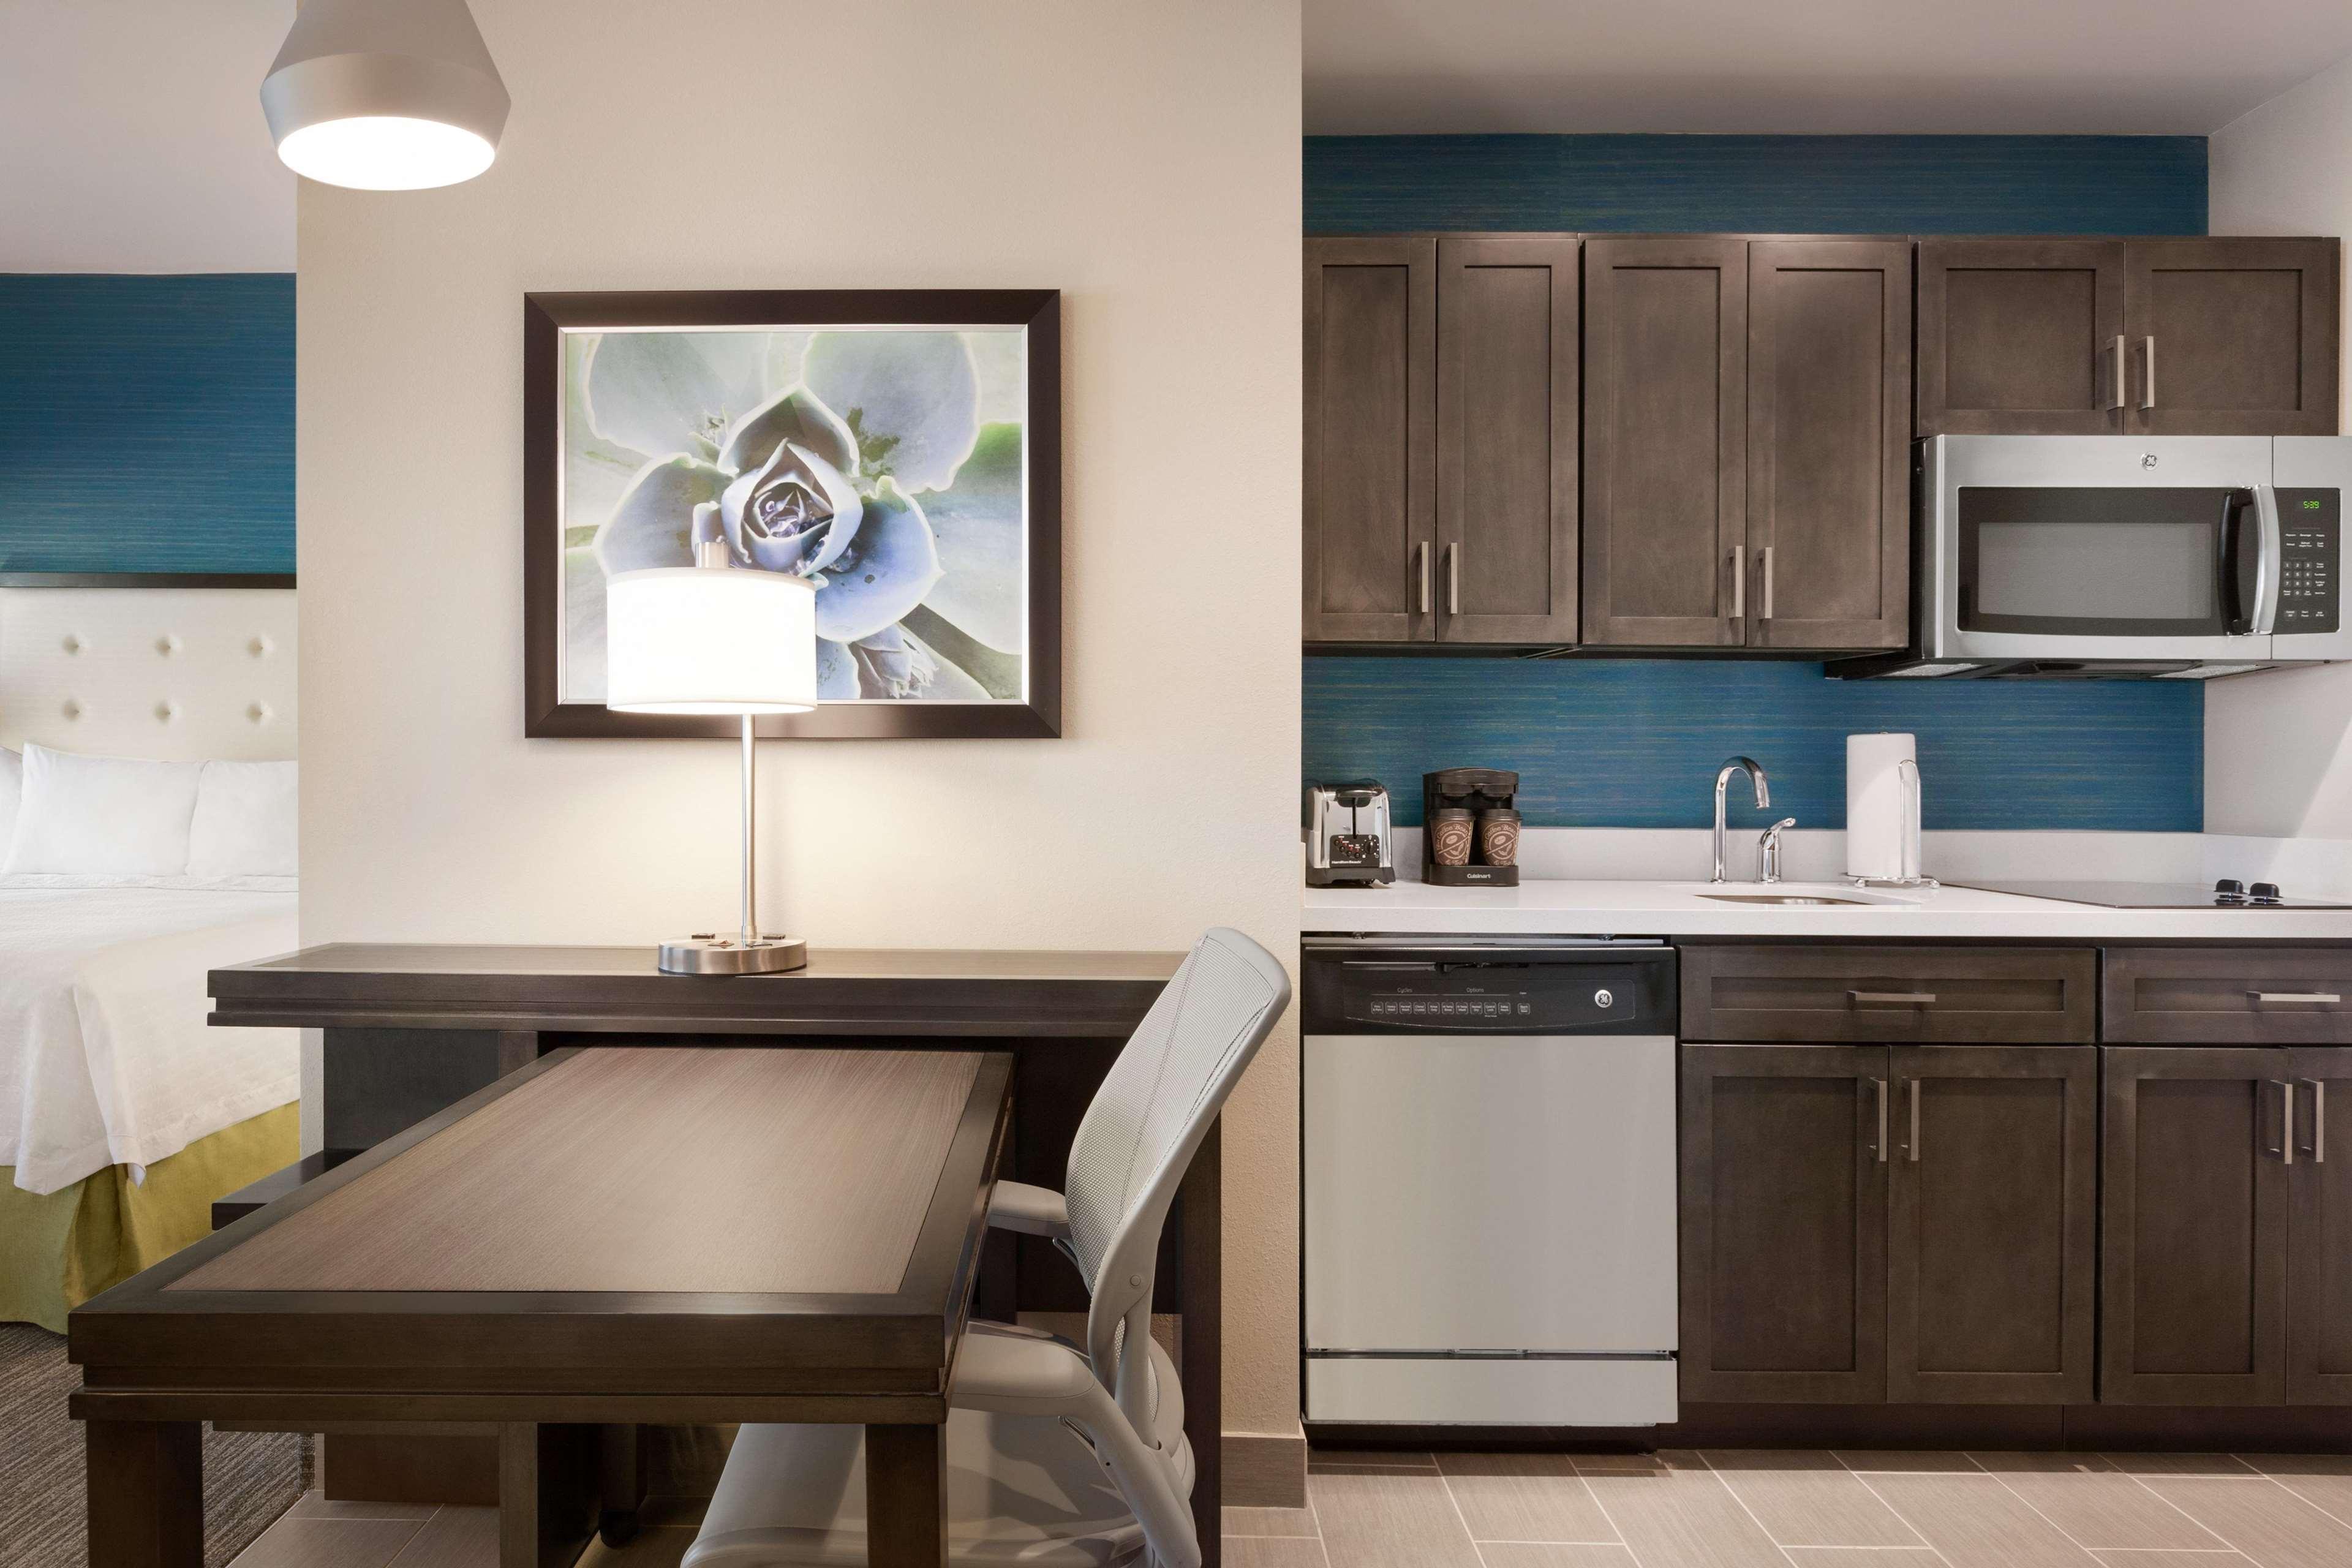 Homewood Suites by Hilton Charlotte/SouthPark image 18